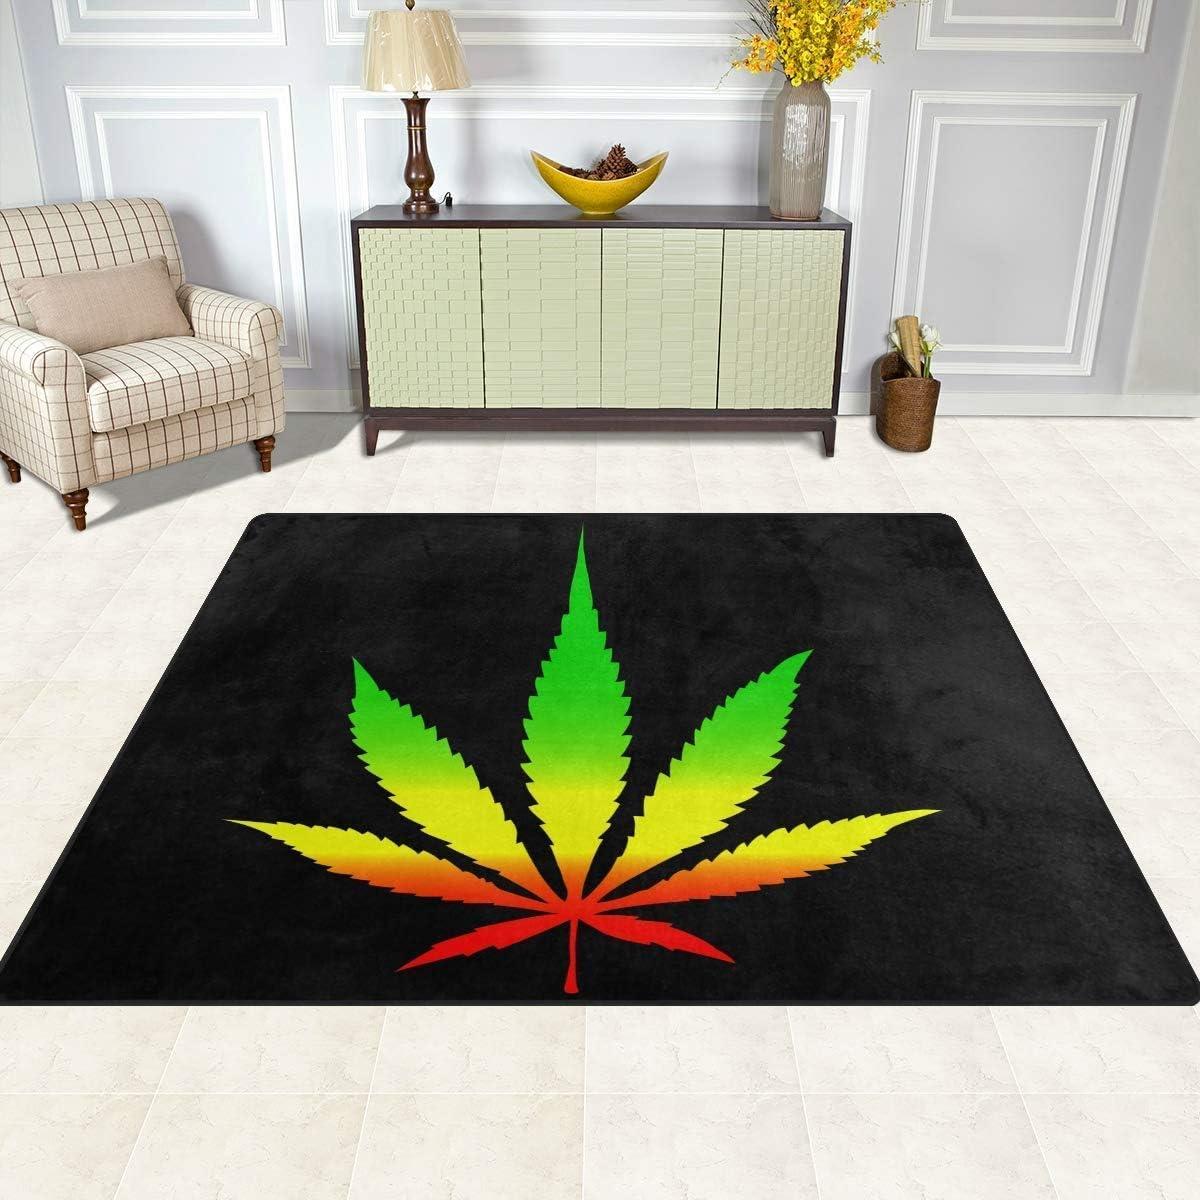 2 x 3 ft ZHYF Rug Marijuana Leave Non Slip Area Rug for Living Dinning Room Bedroom Kitchen Weed Leave Nursery Rug Floor Carpet Yoga Mat 60 x 90 cm